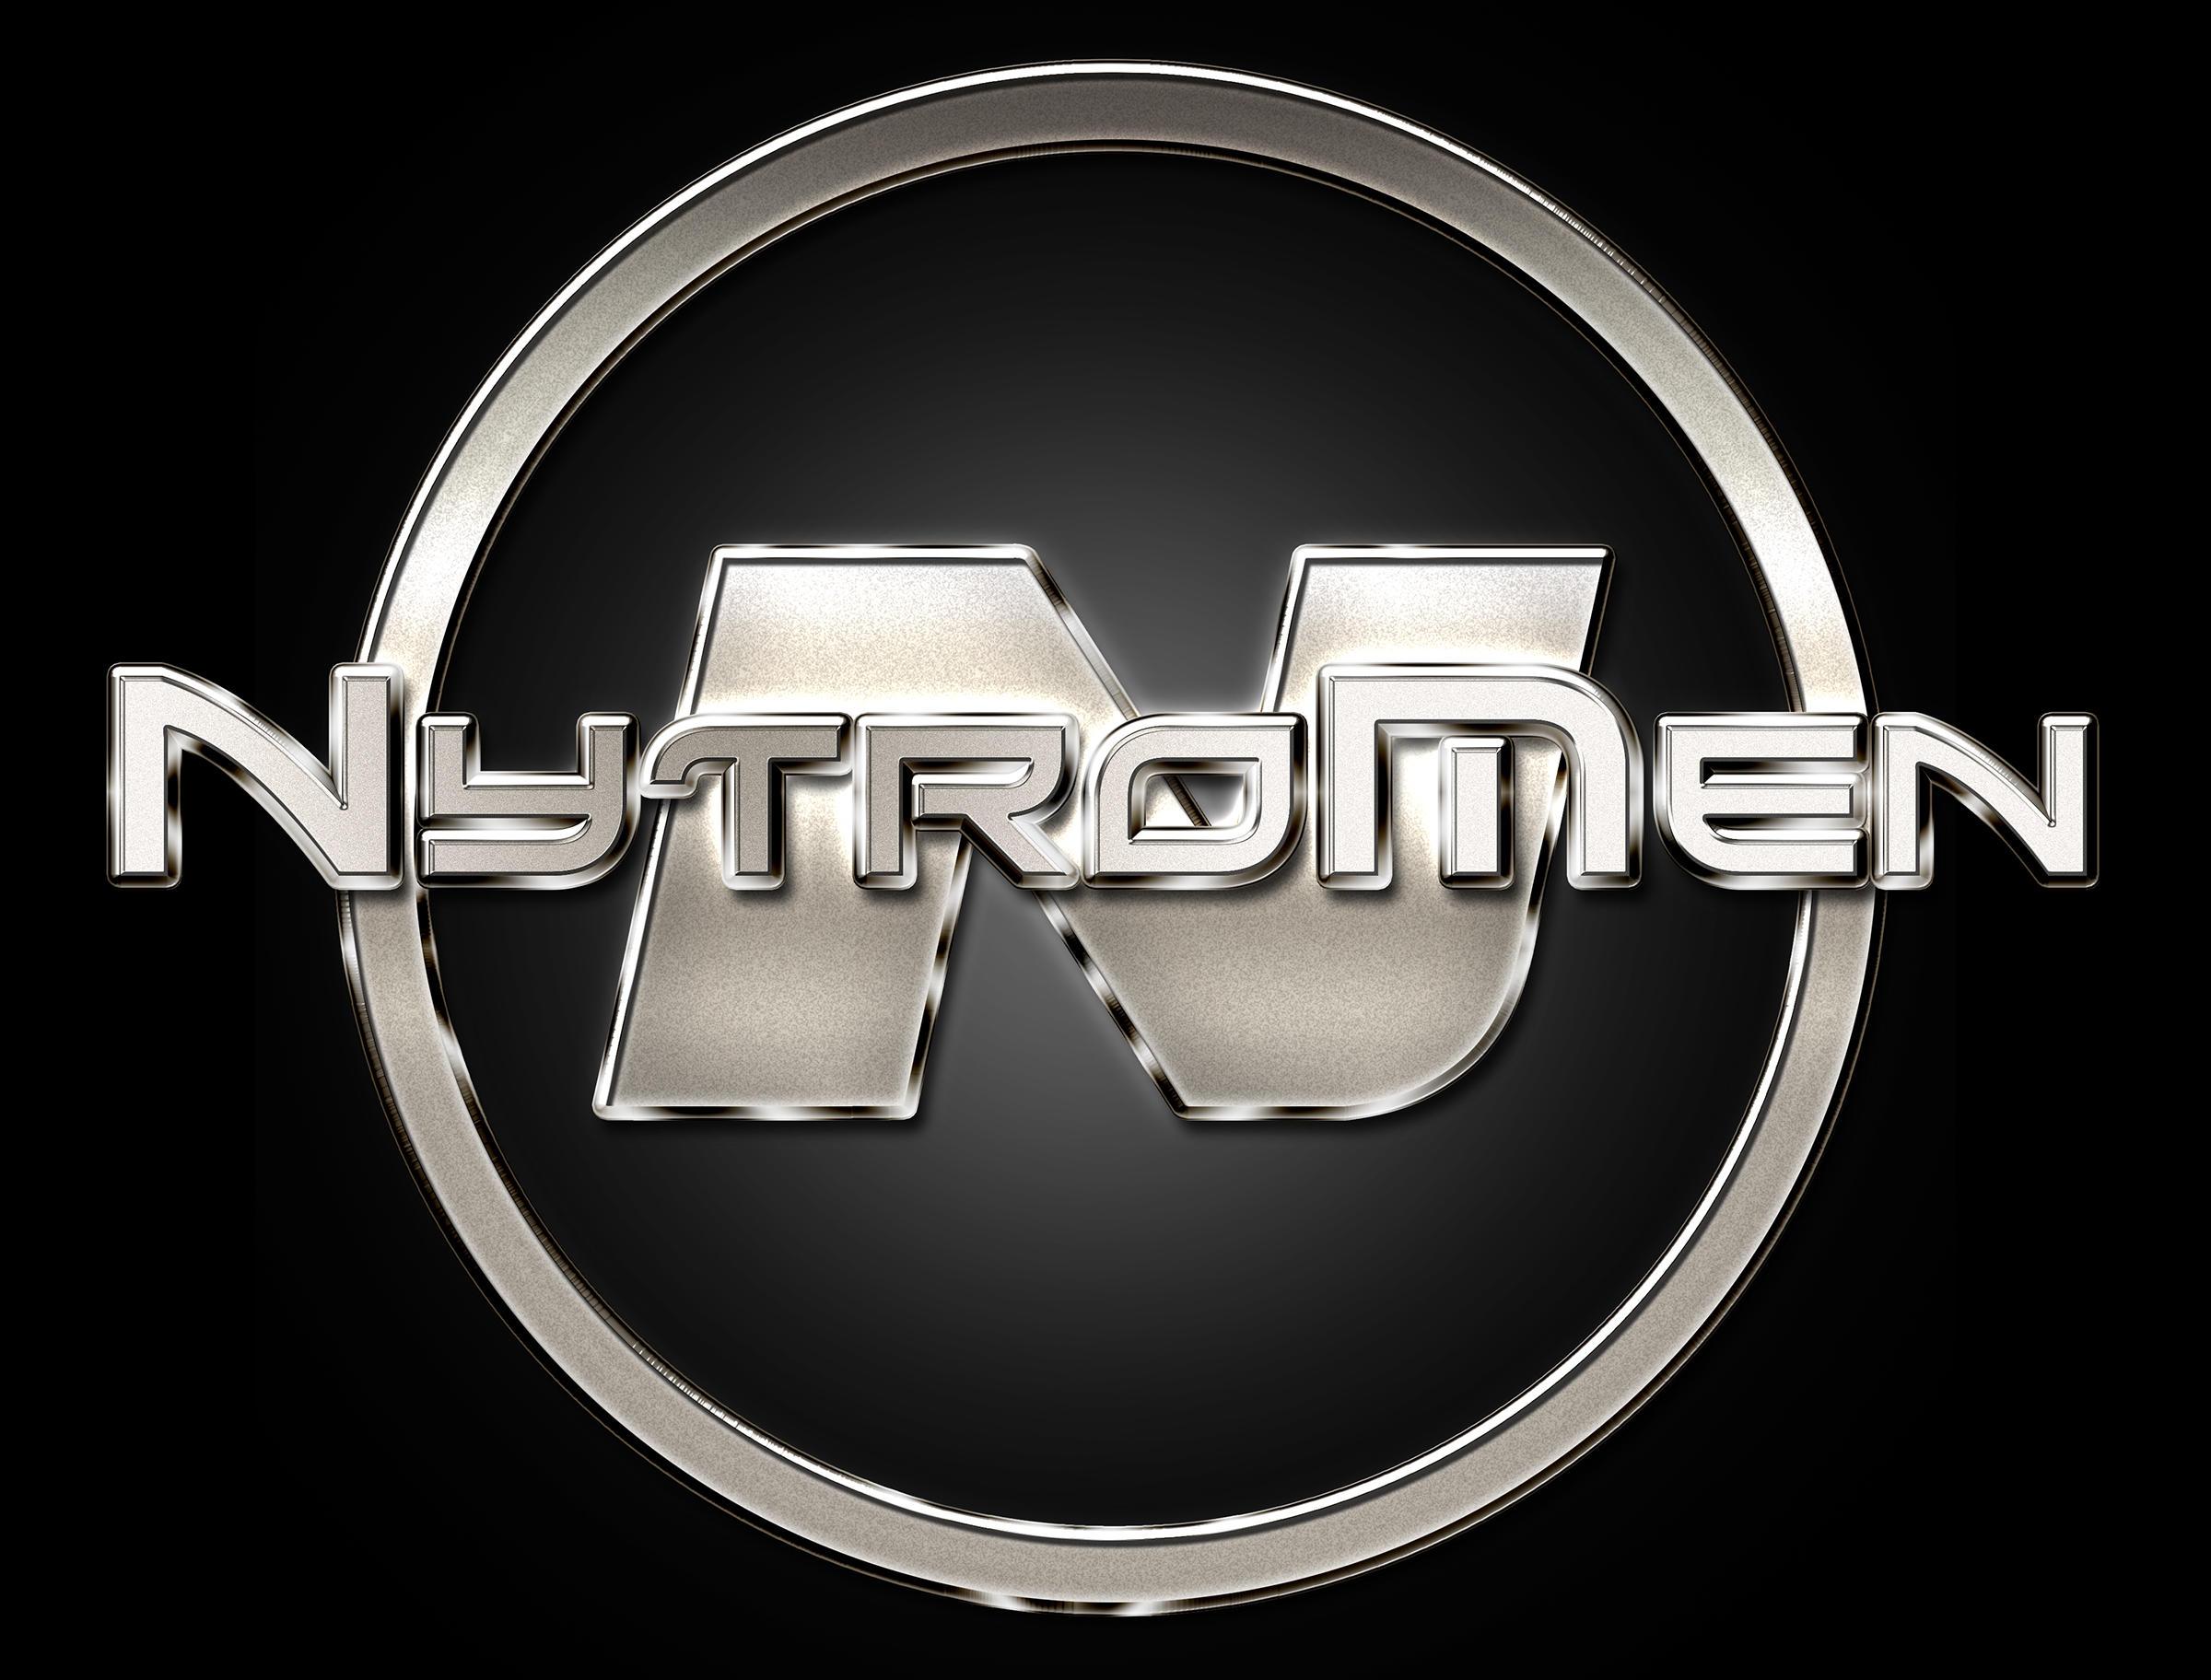 NytroMen Group